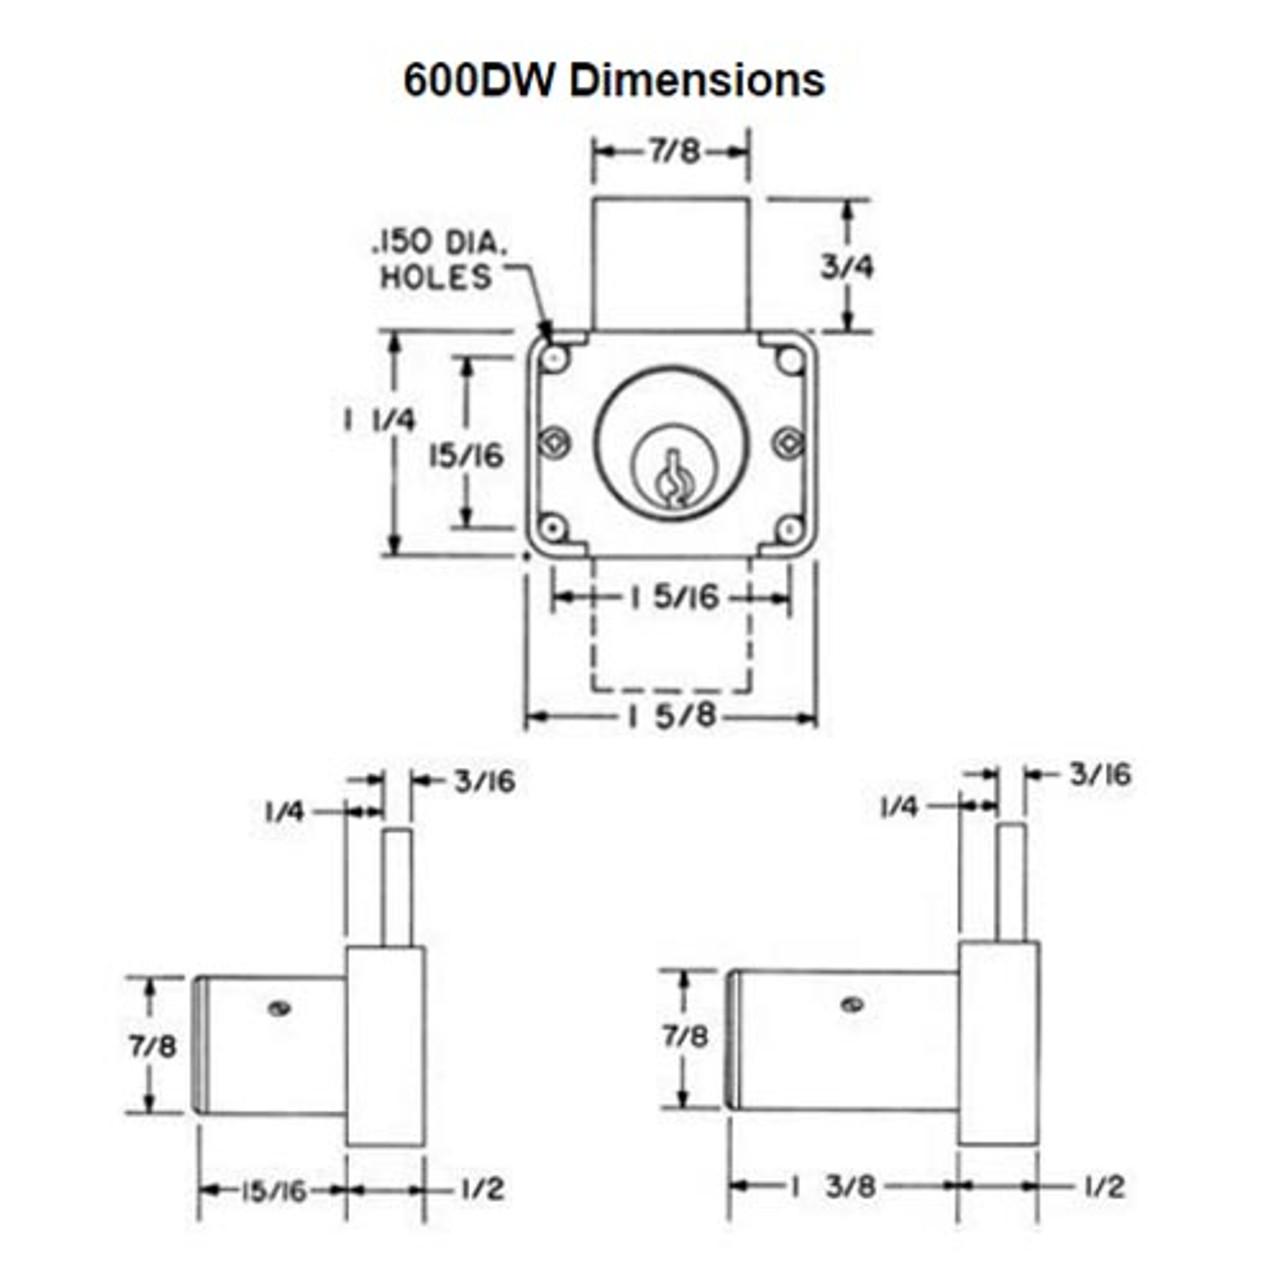 Olympus 600DW-KA4T2-26D-1-3/8 R Series Drawer Deadbolt Cabinet Locks in Satin Chrome